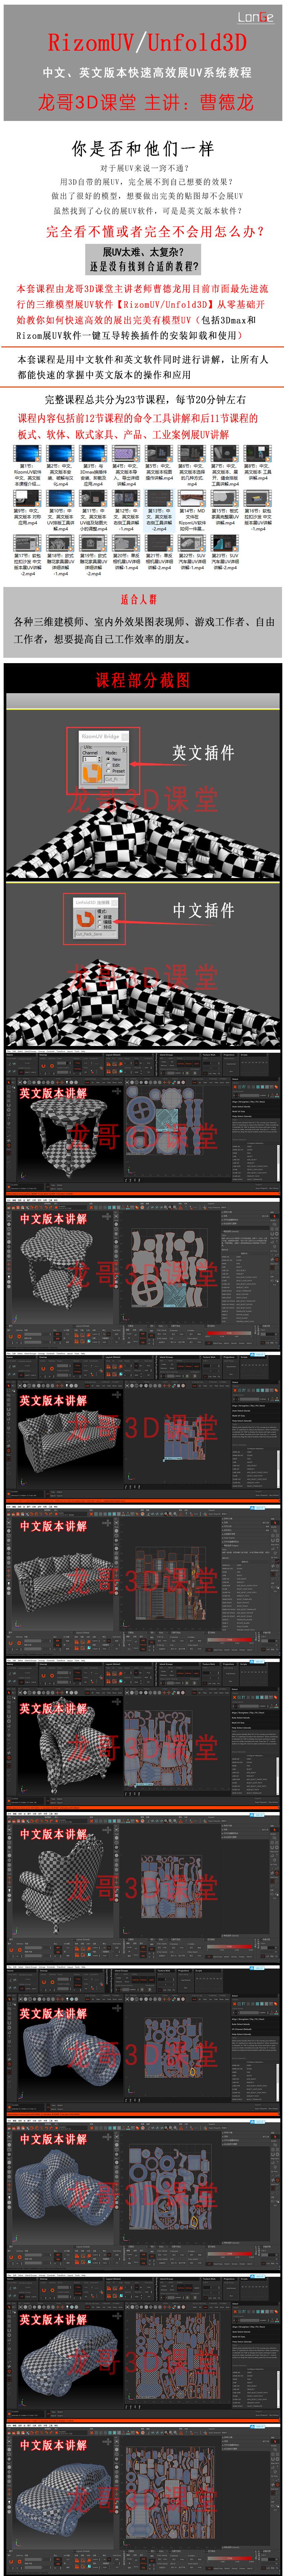 RizmUV /Unfold3D快速展UV系统教程